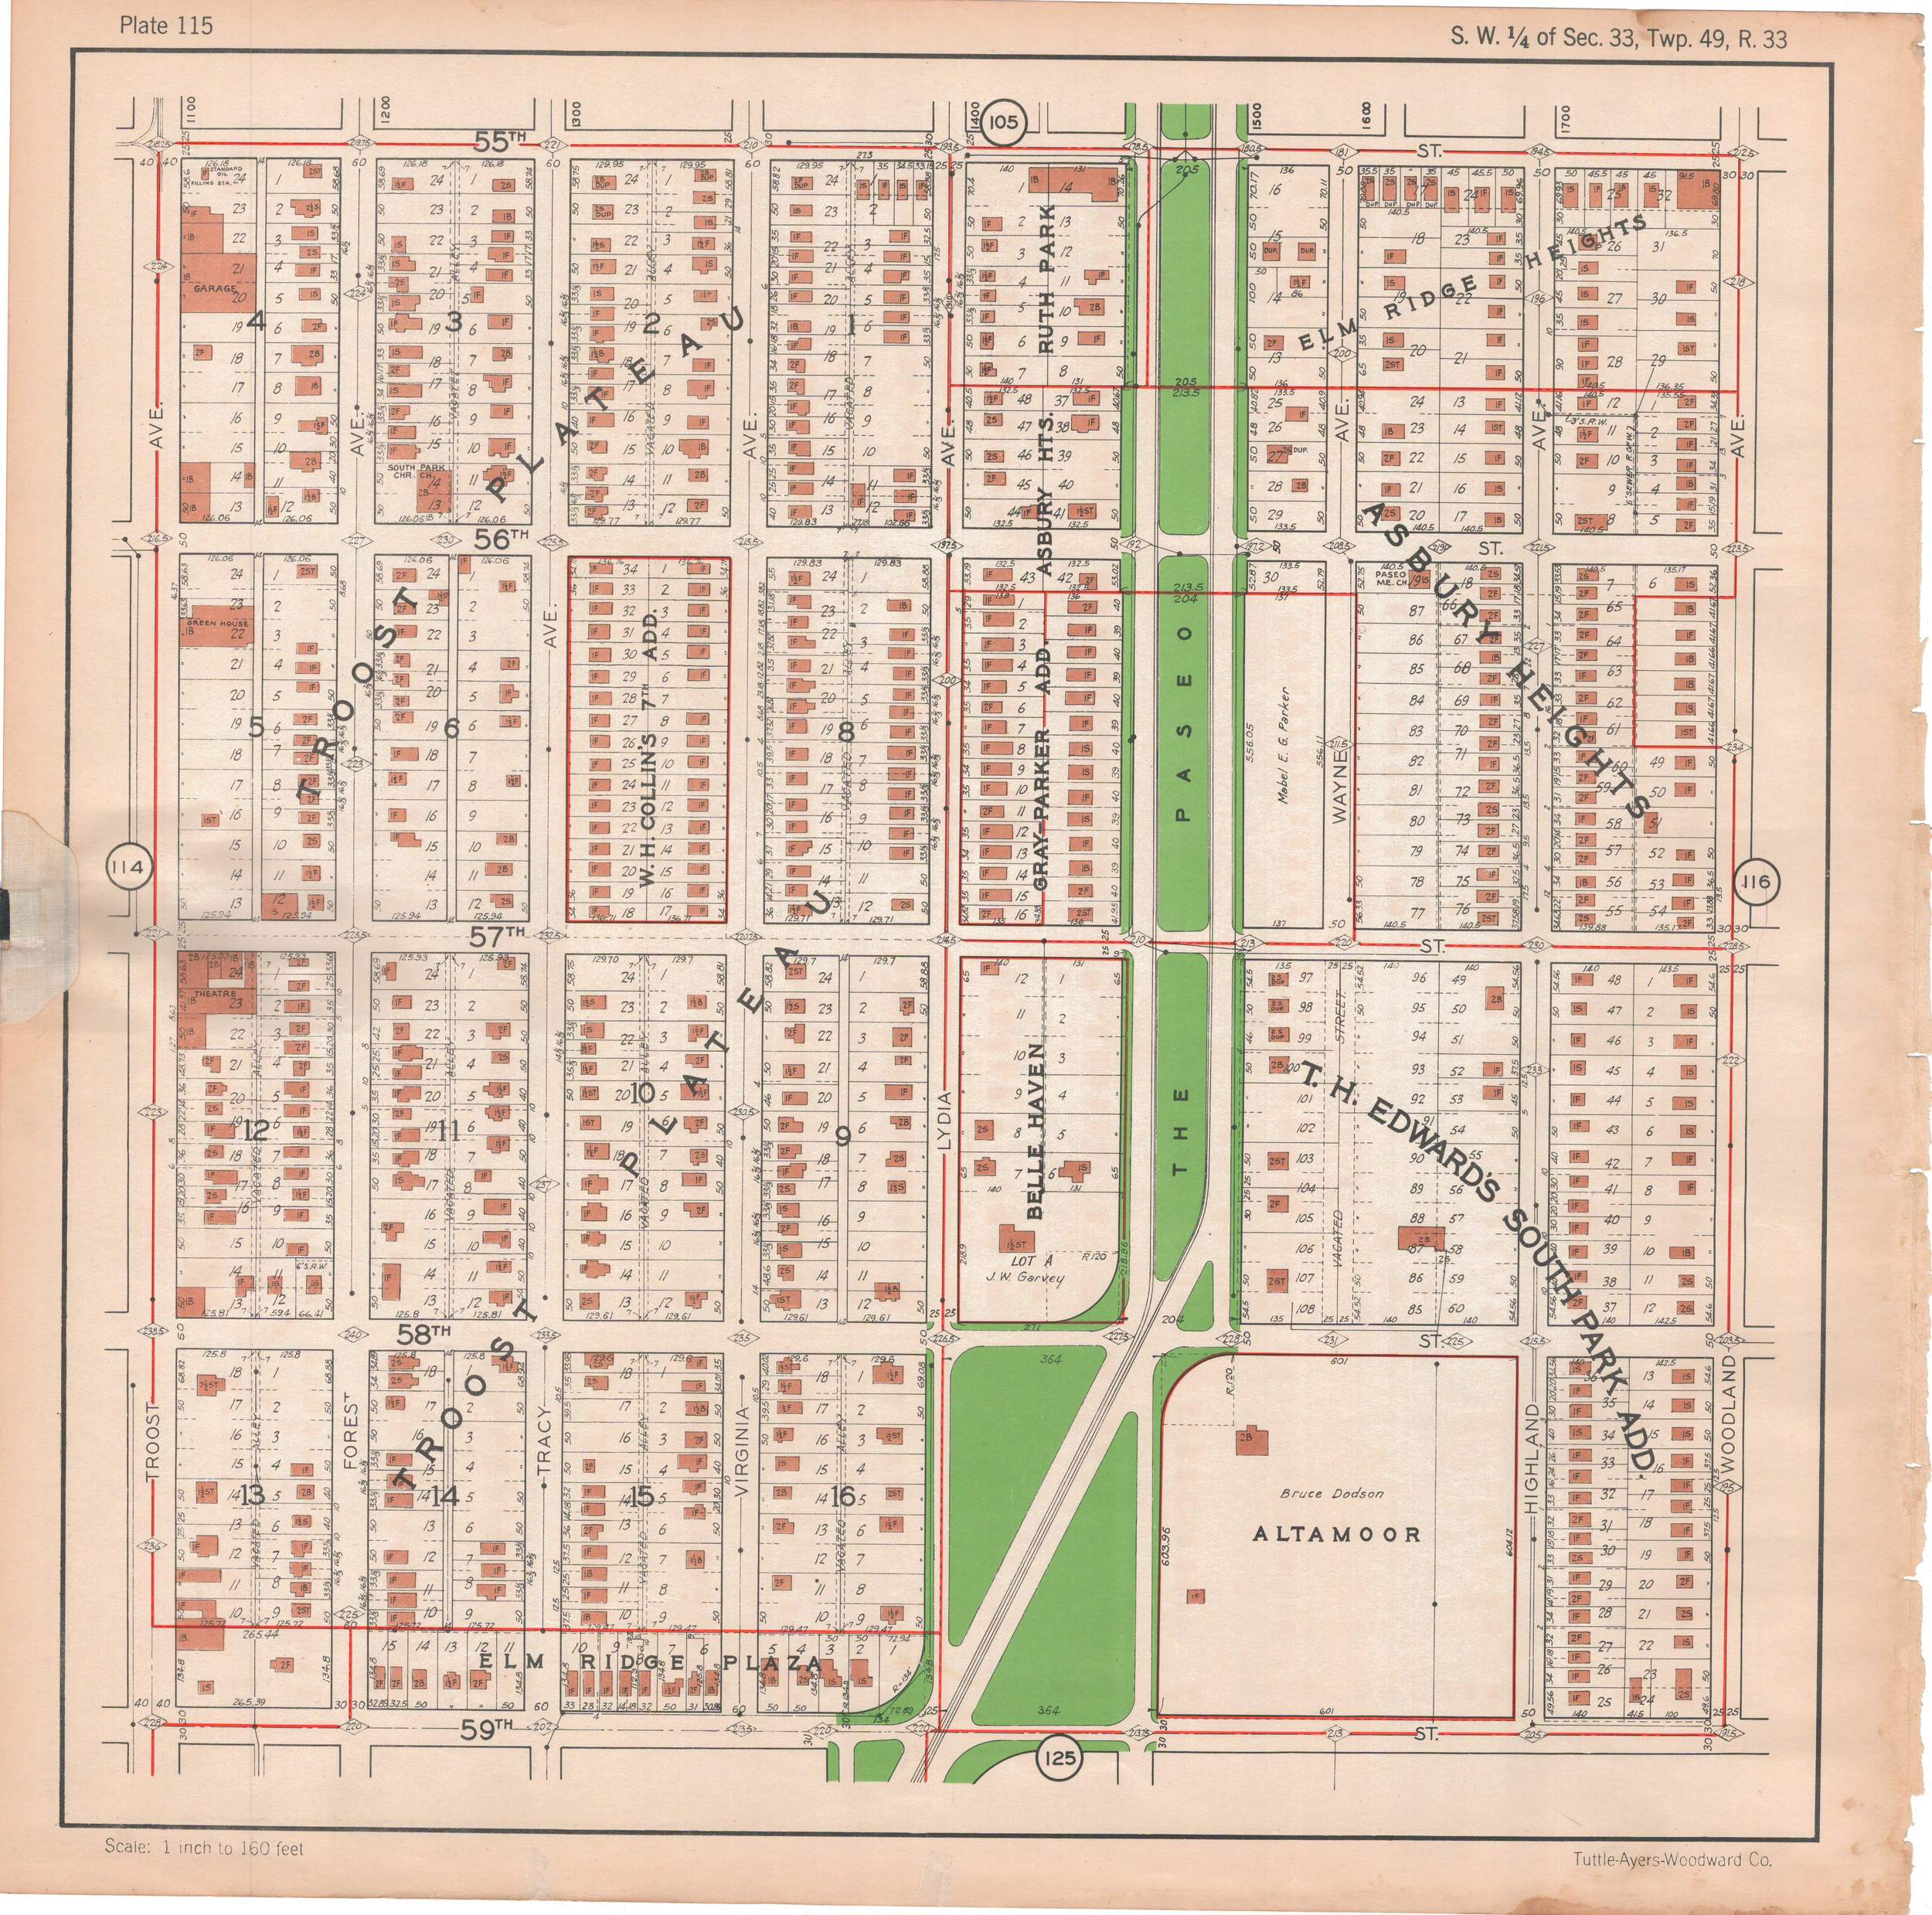 1925 TUTTLE_AYERS_Plate 115.JPG